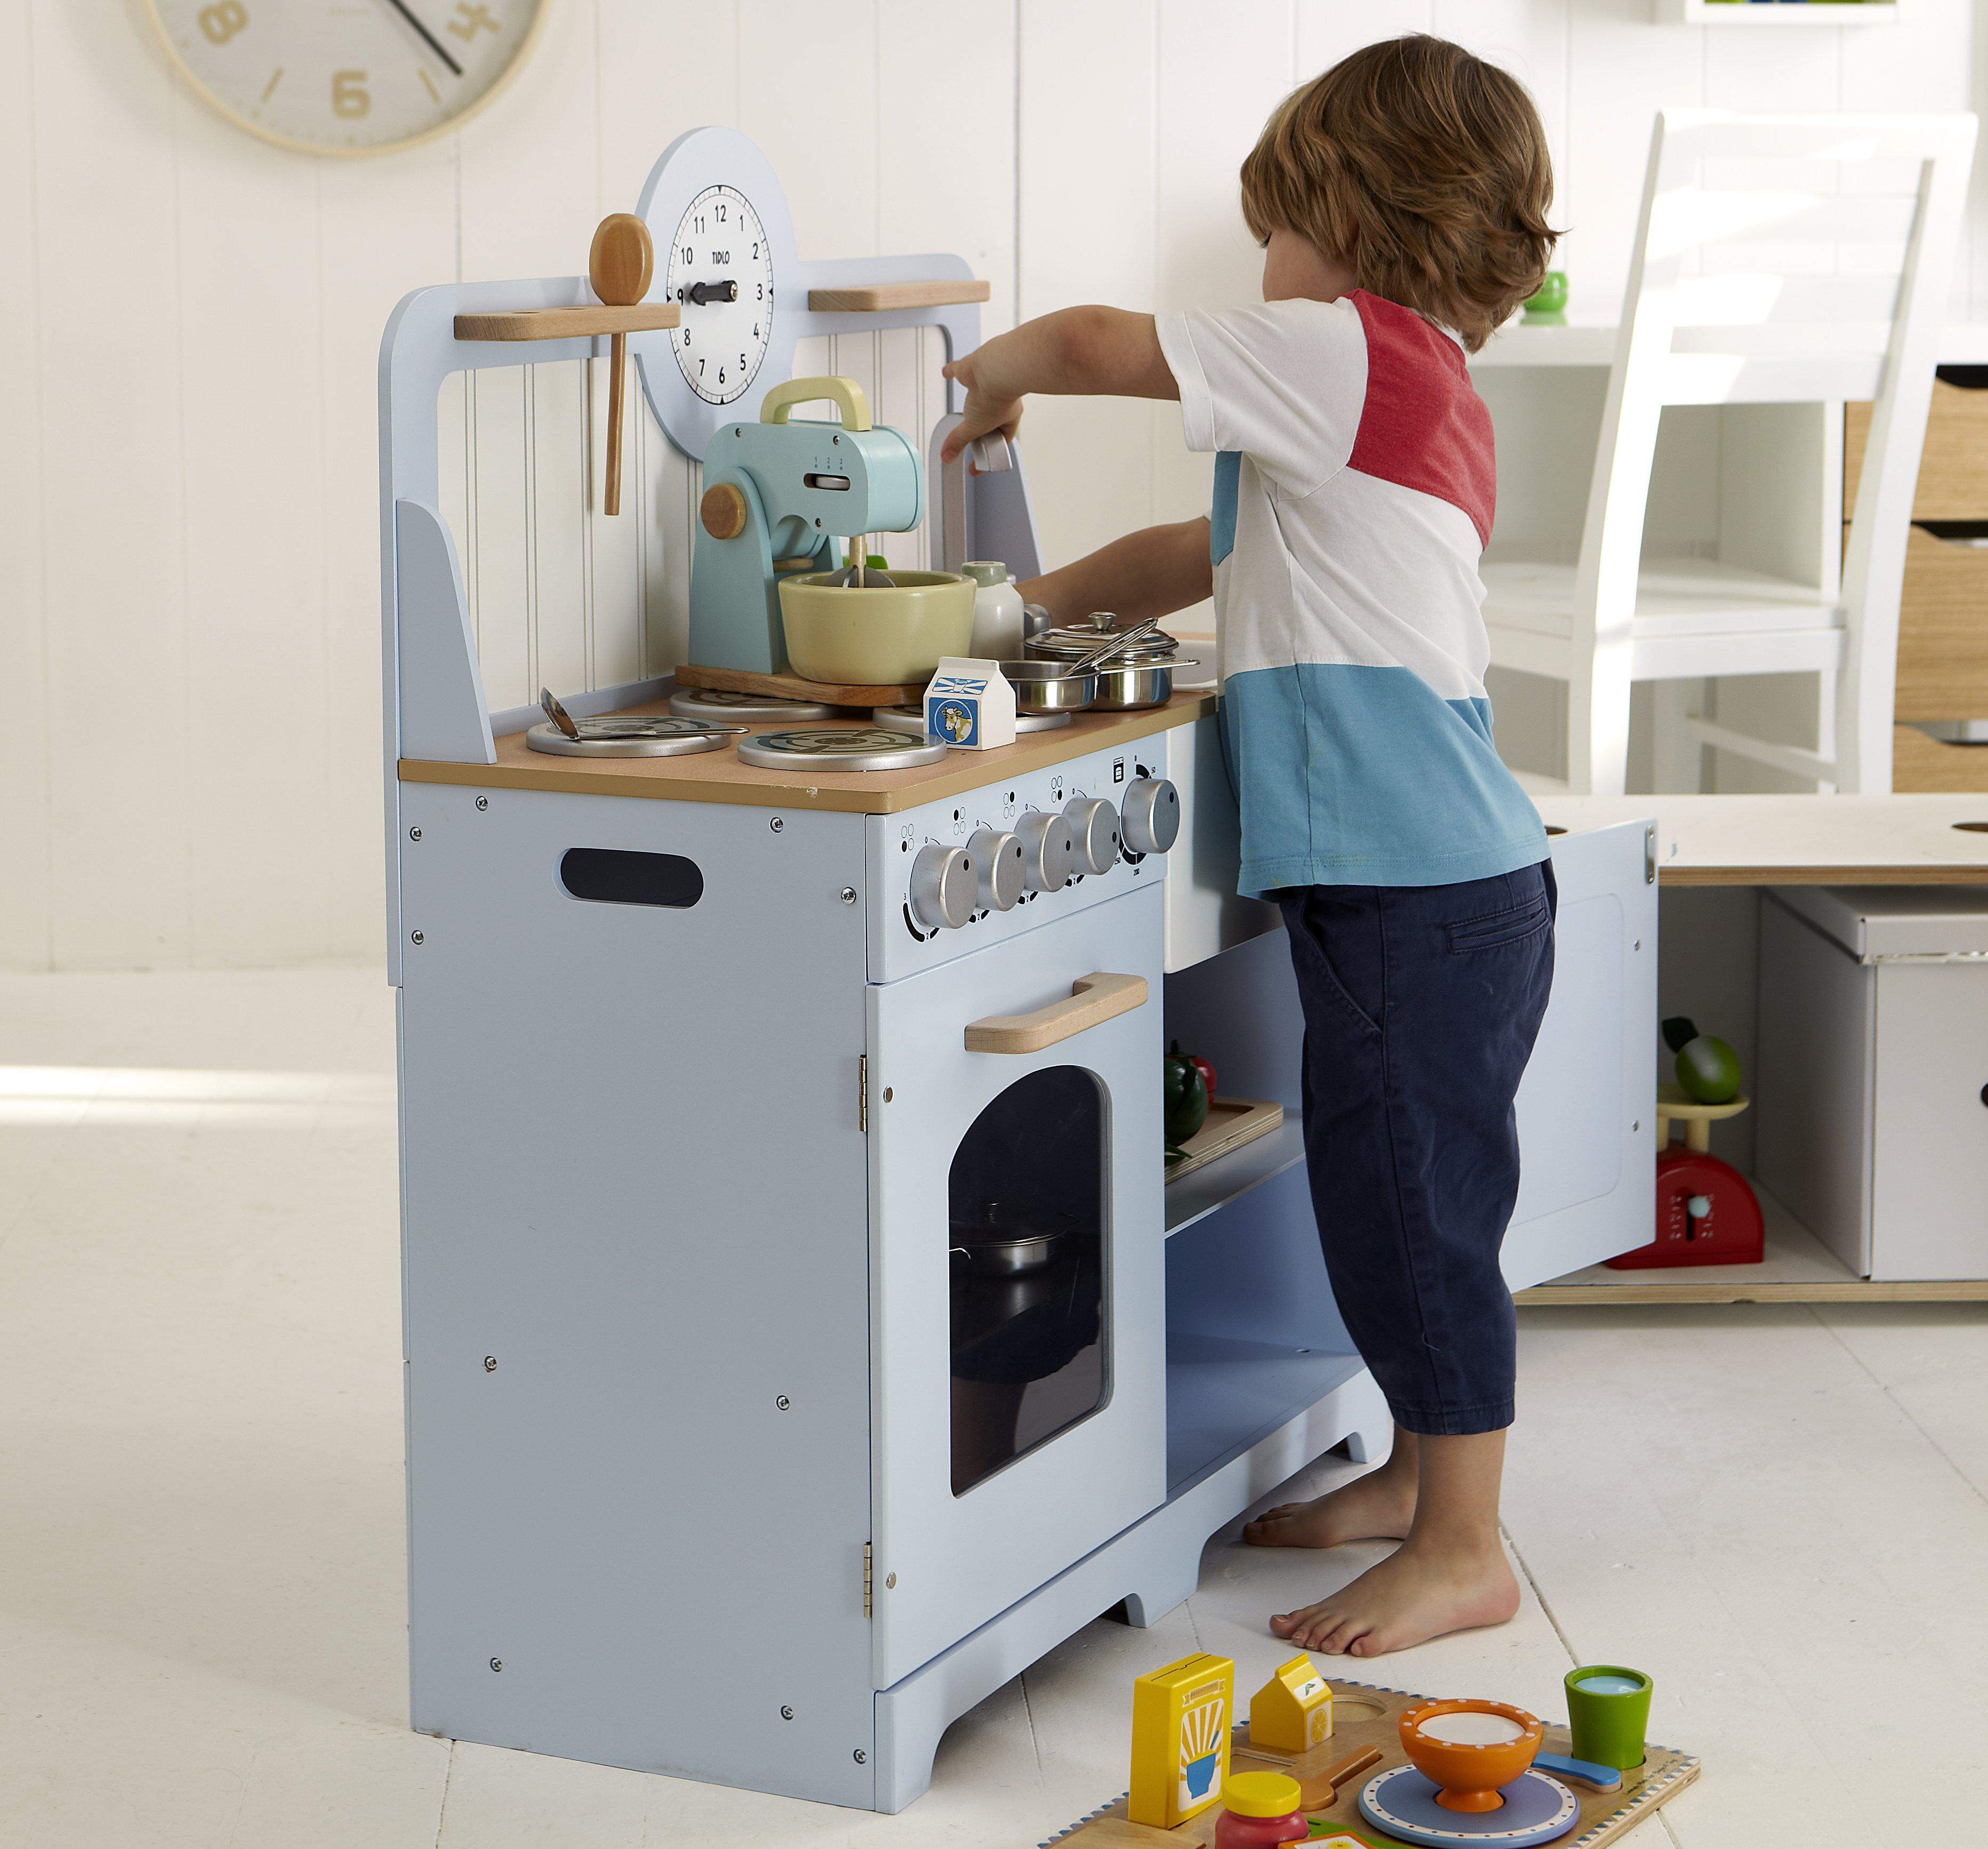 Toy Country Kitchen | Home Decorating, Interior Design, Bath ...